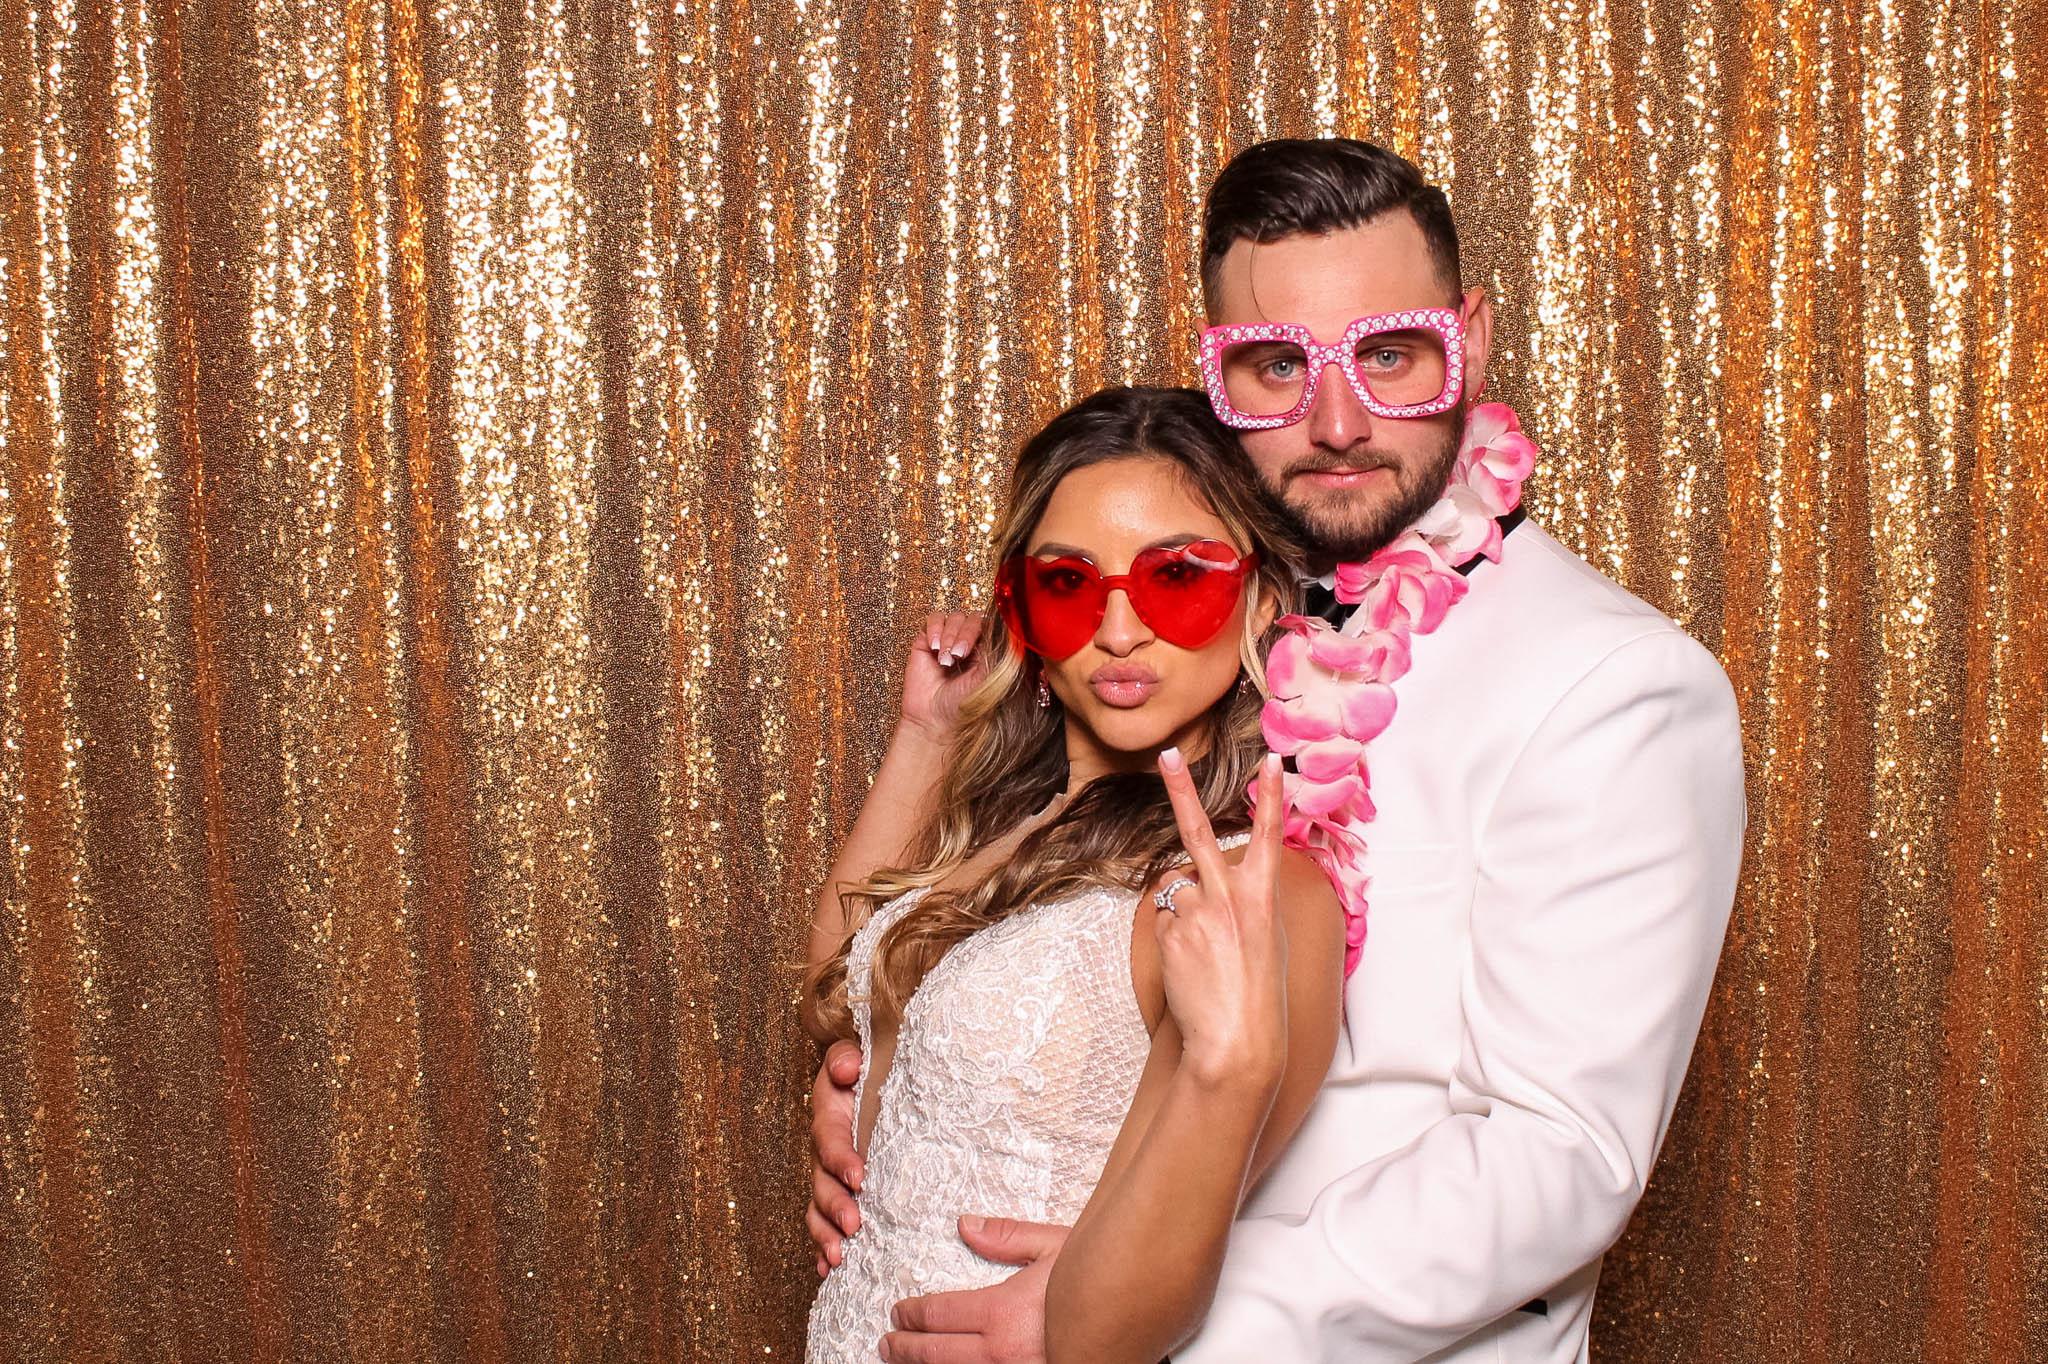 Evita and Chris's Wedding Photo Booth